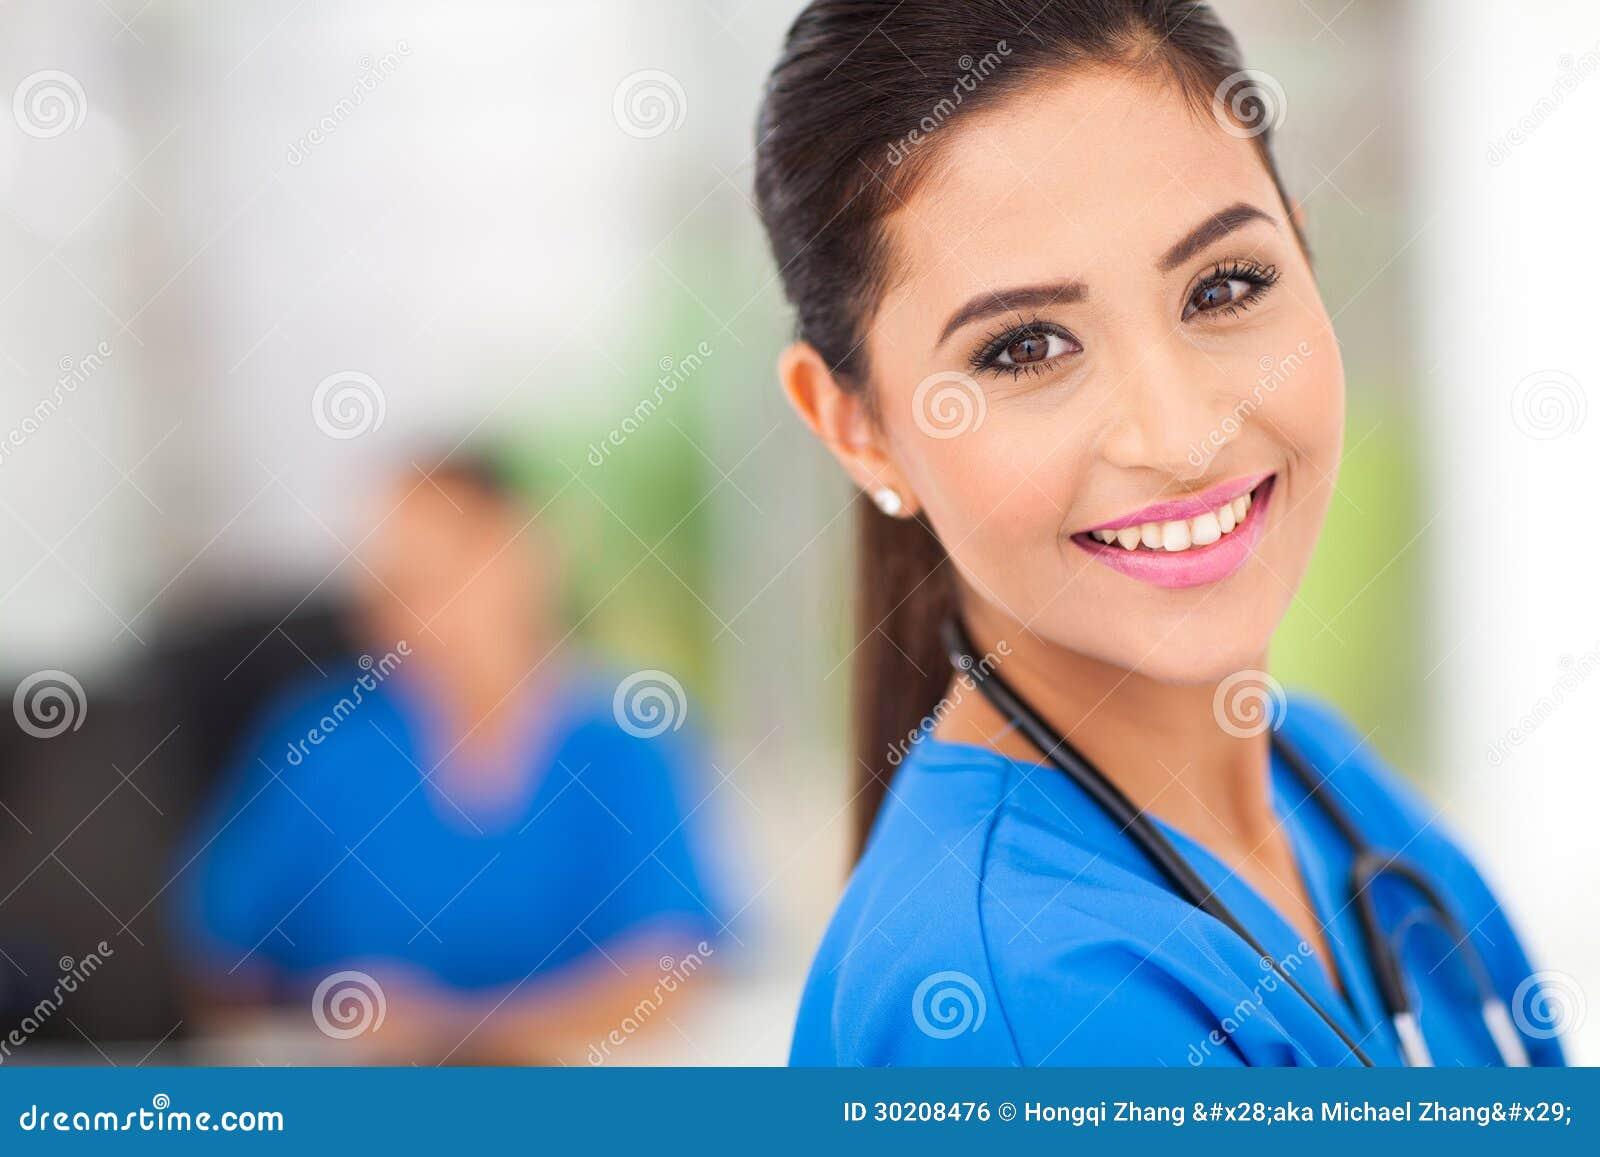 Medical worker closeup